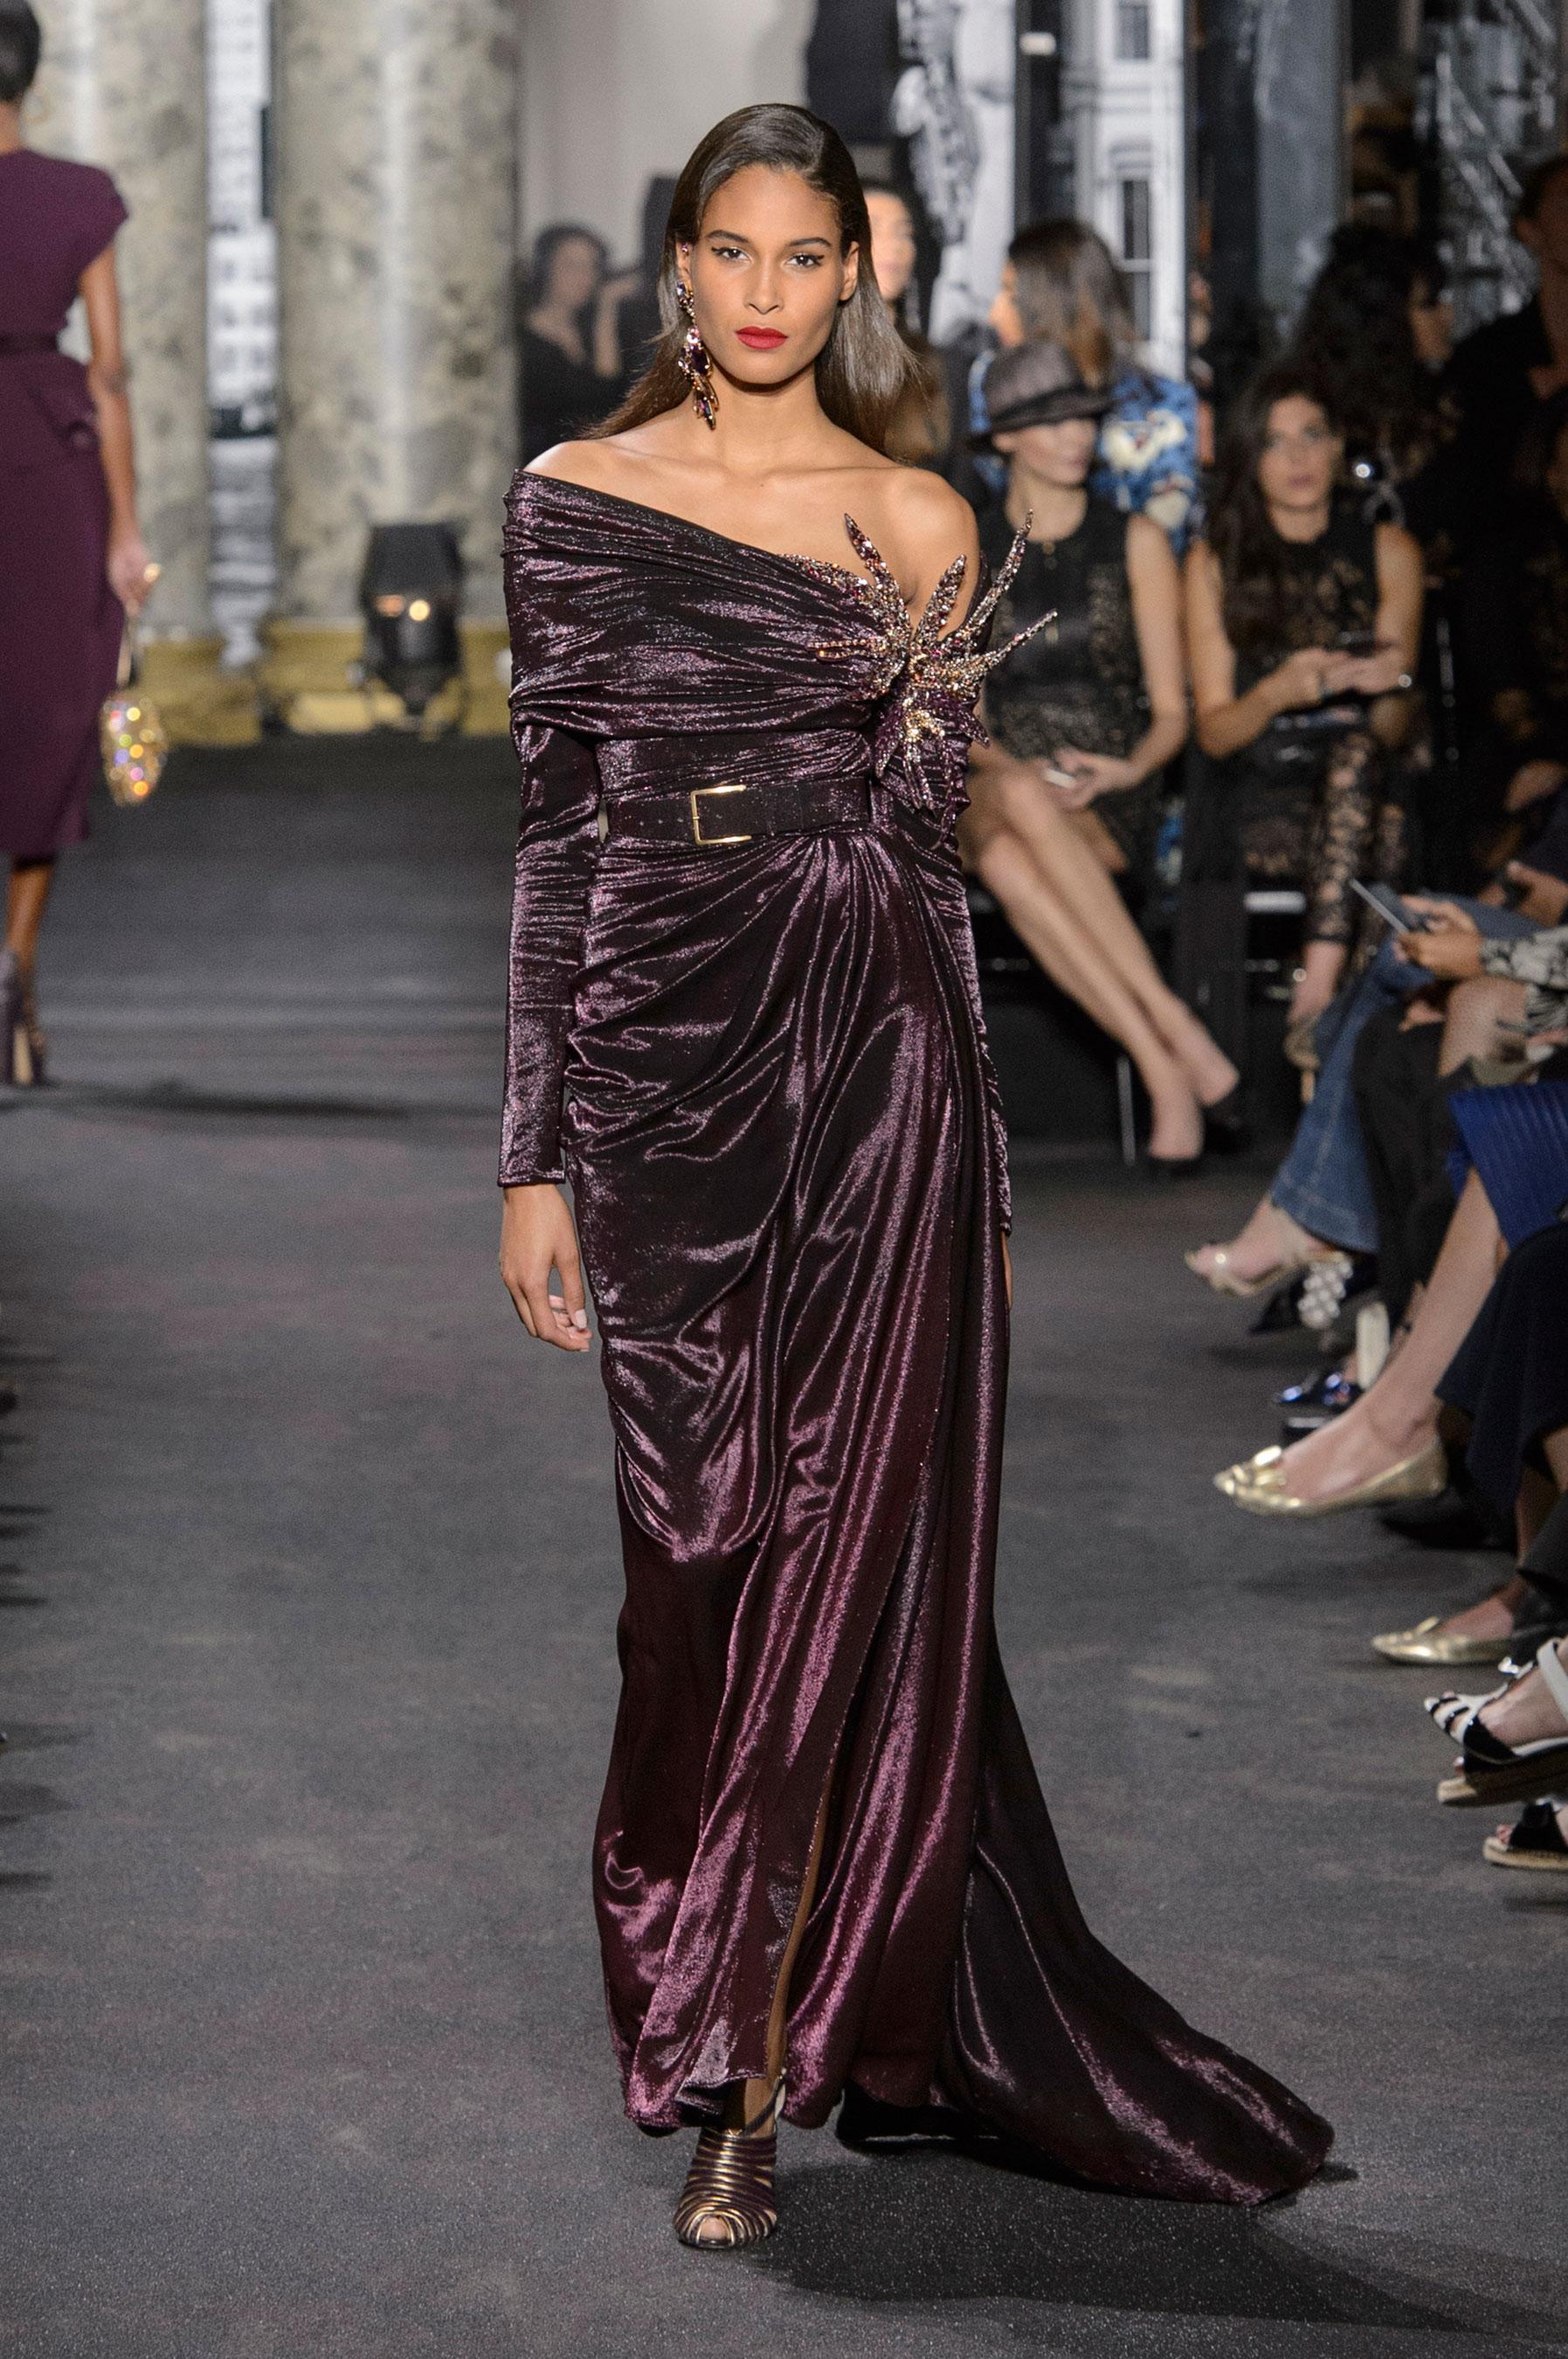 3f4a3bf9937c Défilé Elie Saab Automne-hiver 2016-2017 Couture - Madame Figaro